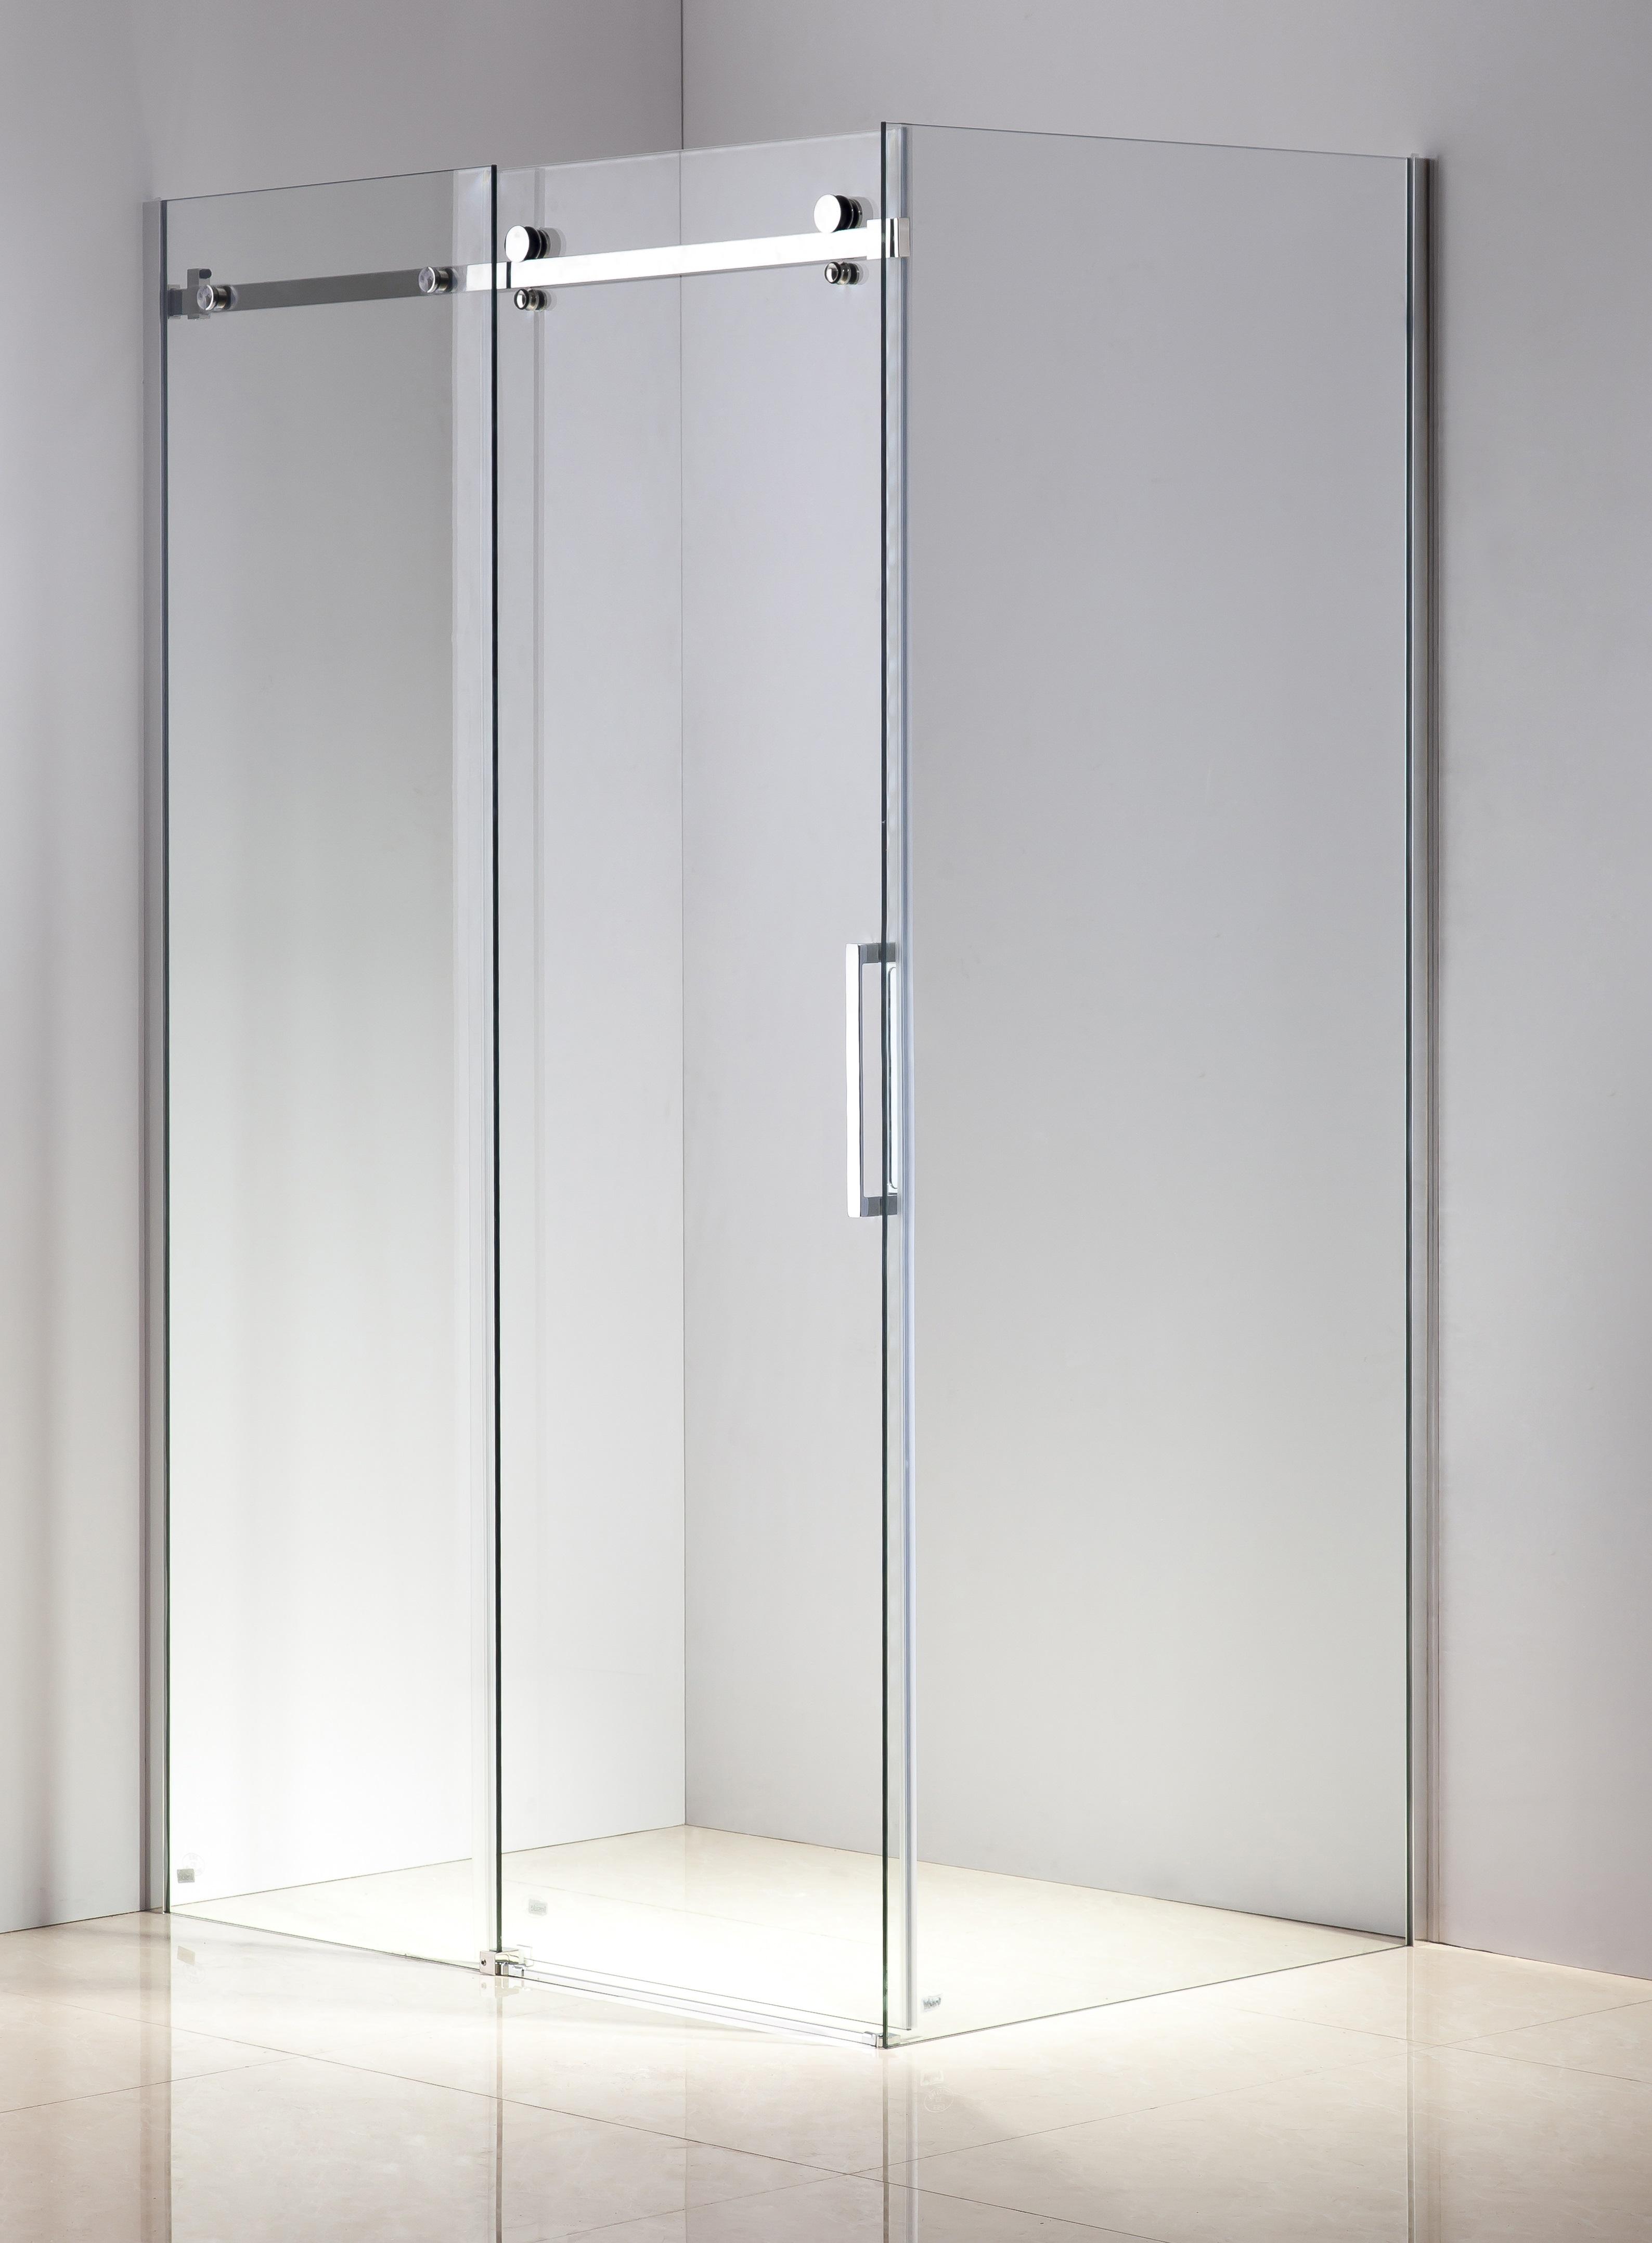 Shower Screen 1200x900x1950mm Frameless Glass Sliding Door By Della Francesca  Z2679